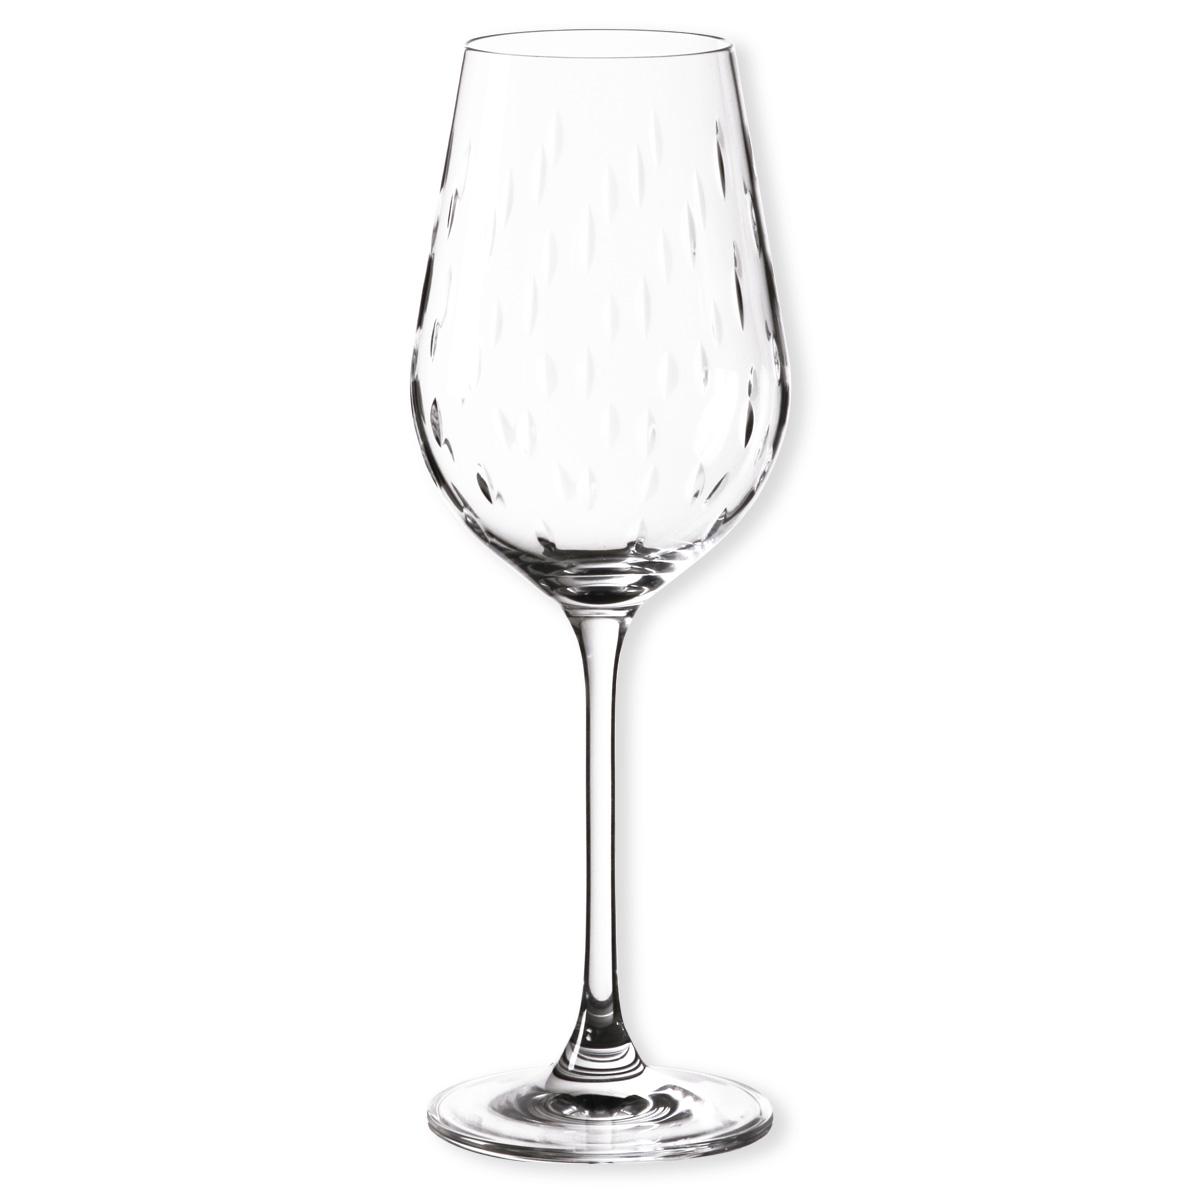 verre vin design bulles taill es la main 35cl. Black Bedroom Furniture Sets. Home Design Ideas